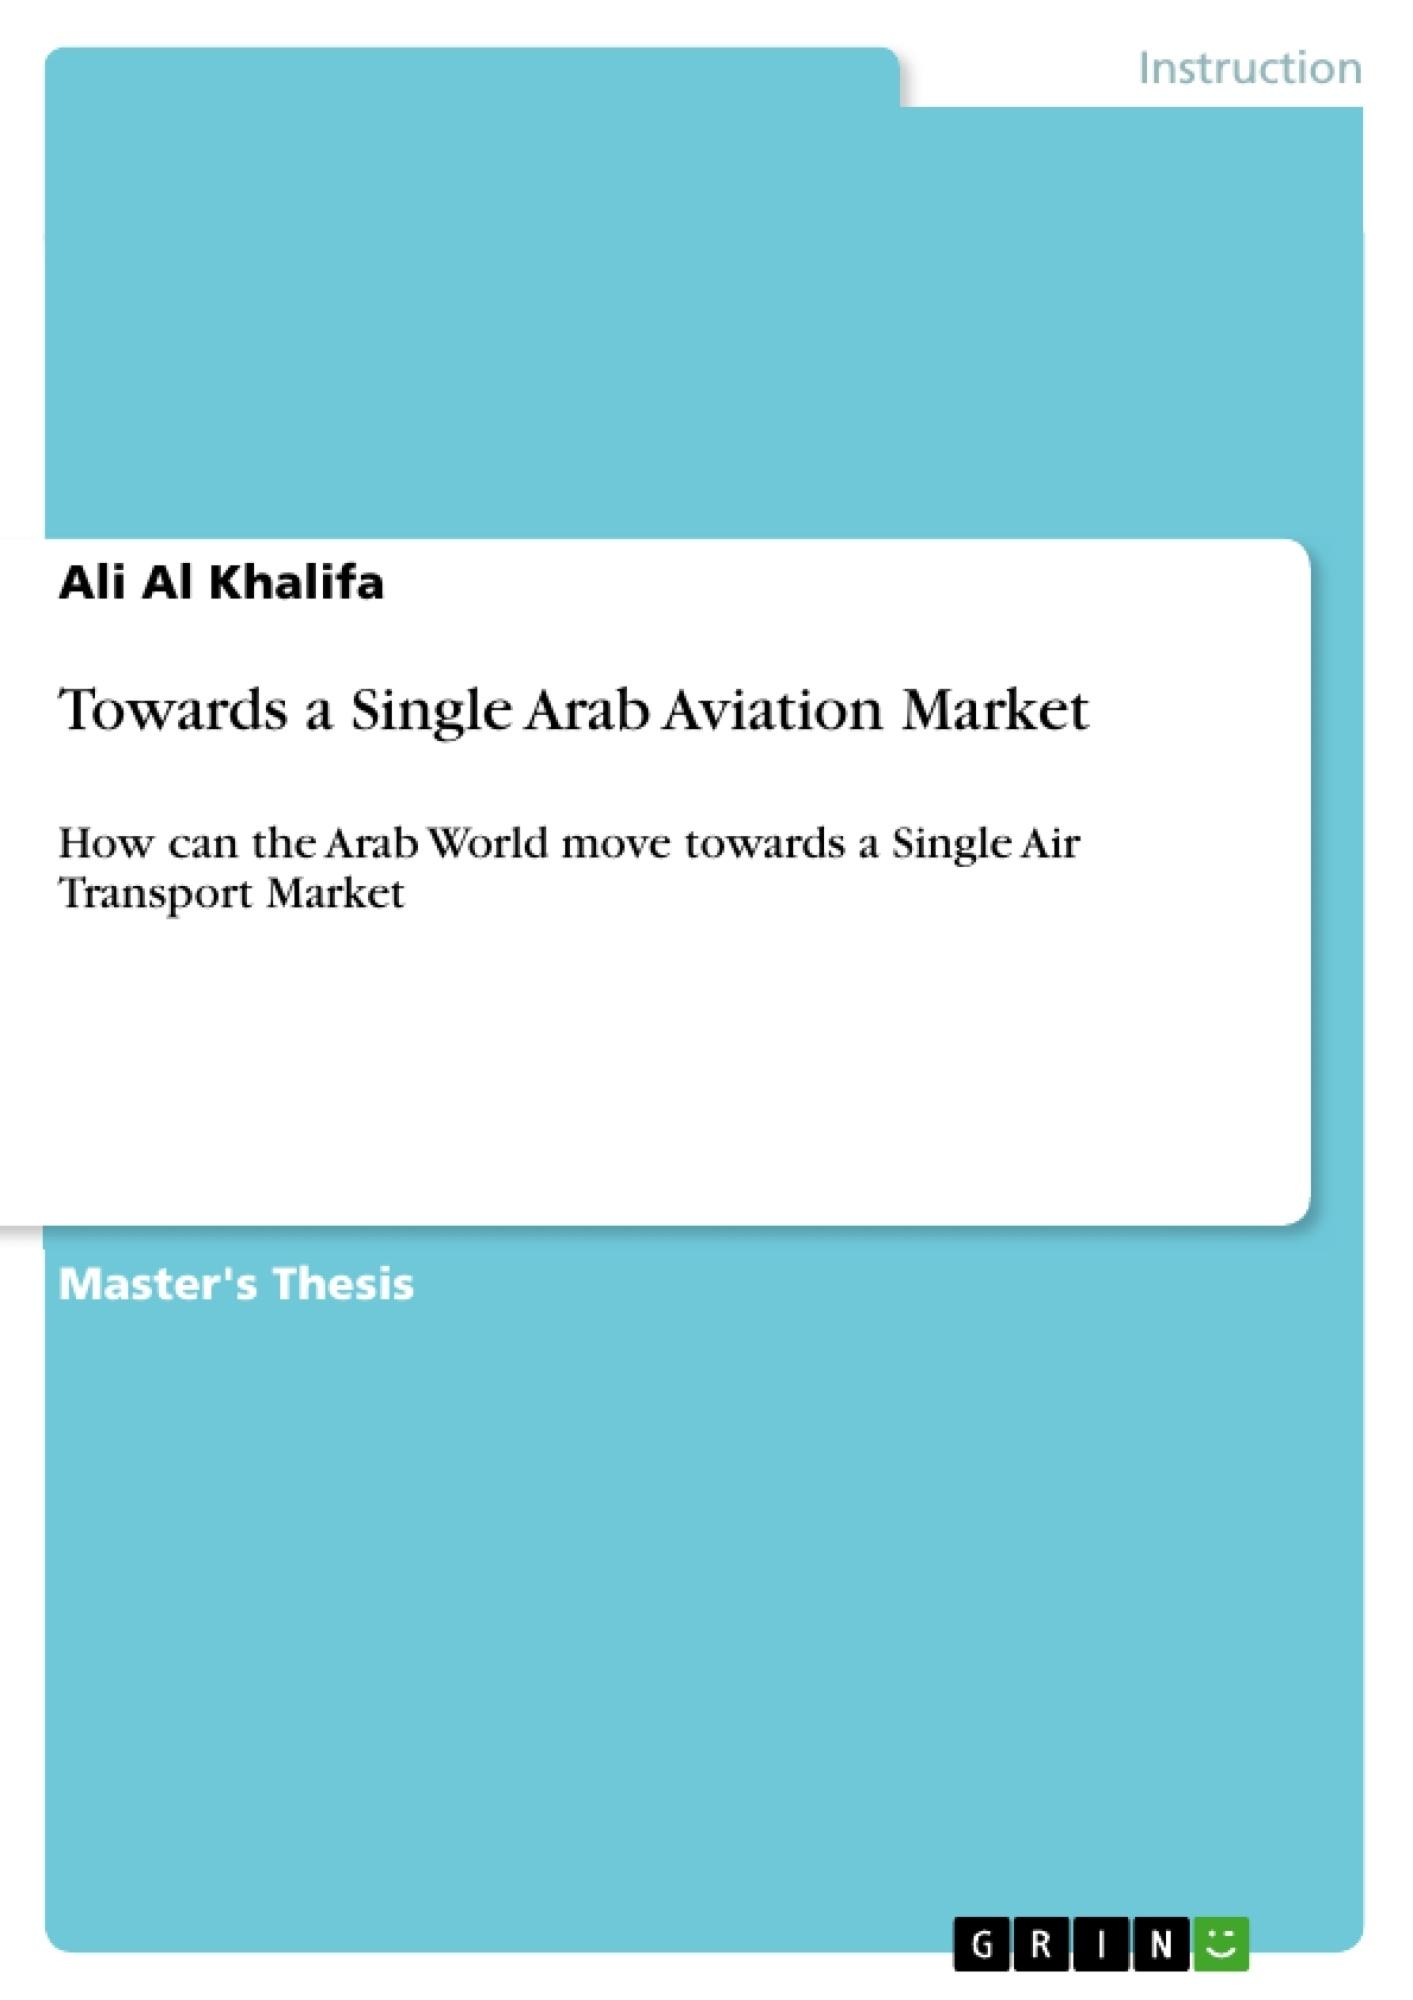 Title: Towards a Single Arab Aviation Market